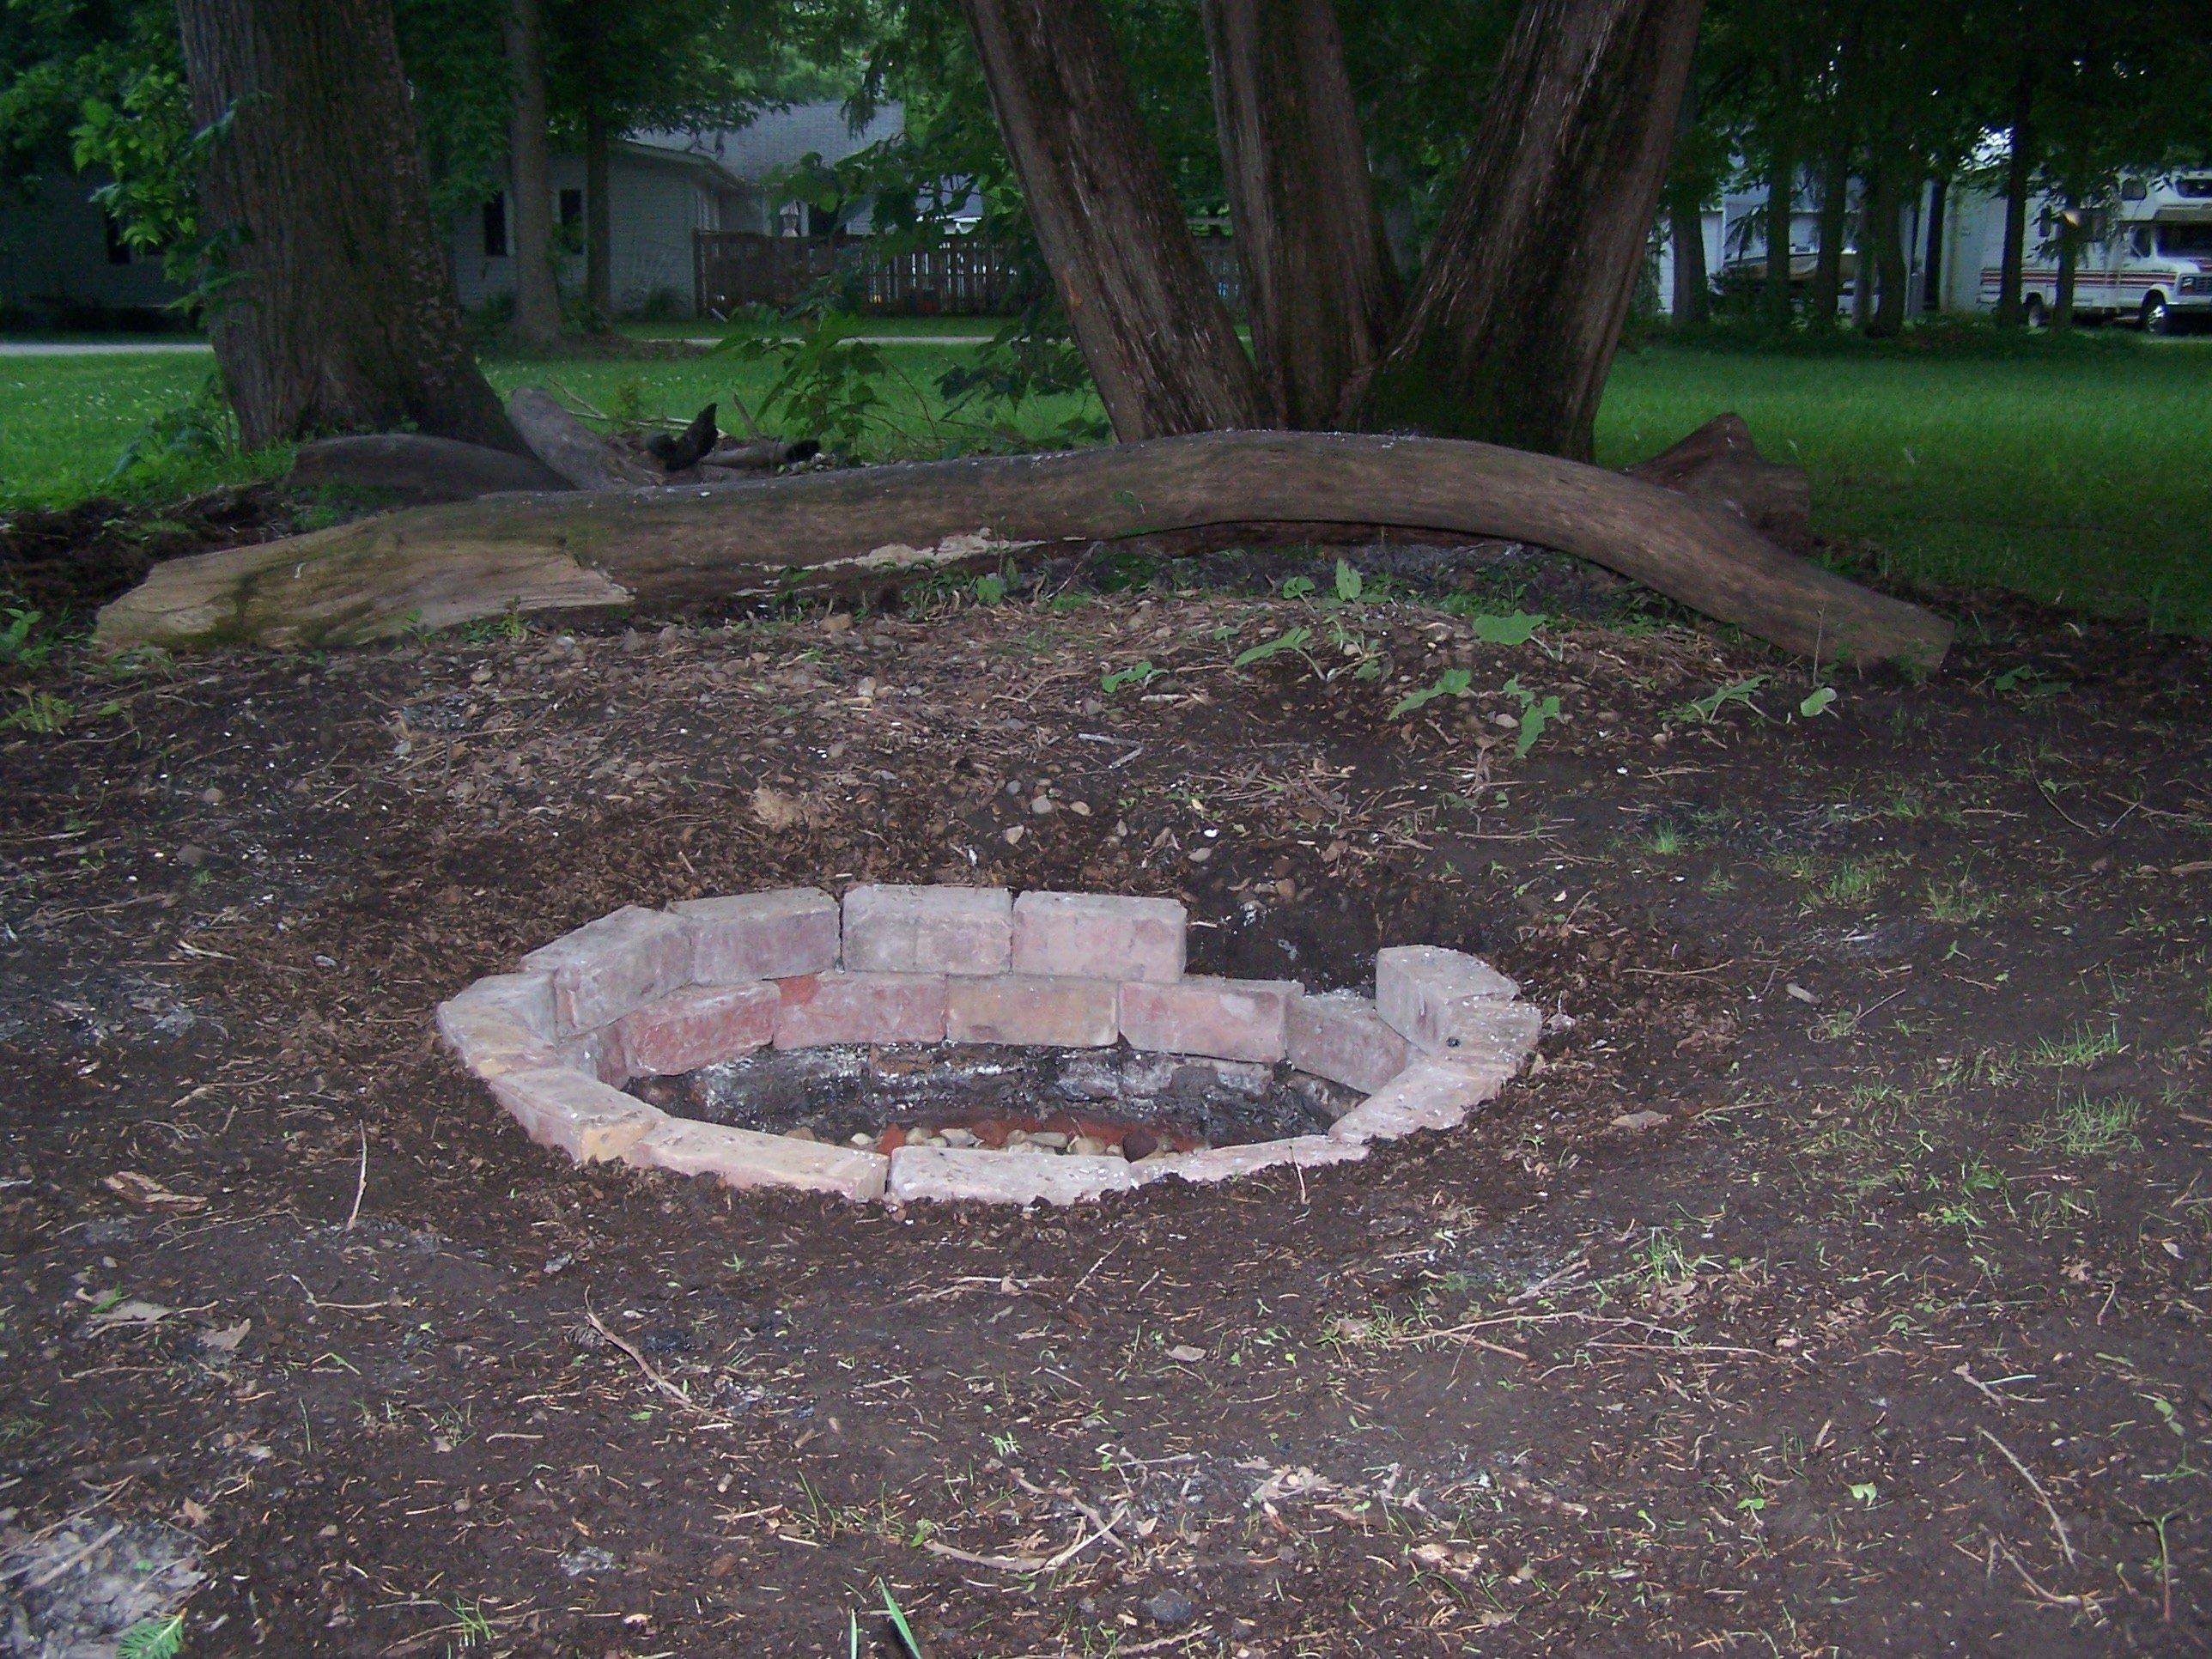 10 Great Outdoor Fire Pit Ideas Backyard creative small patio fire pit ideas outdoor backyard and image ideas 2020